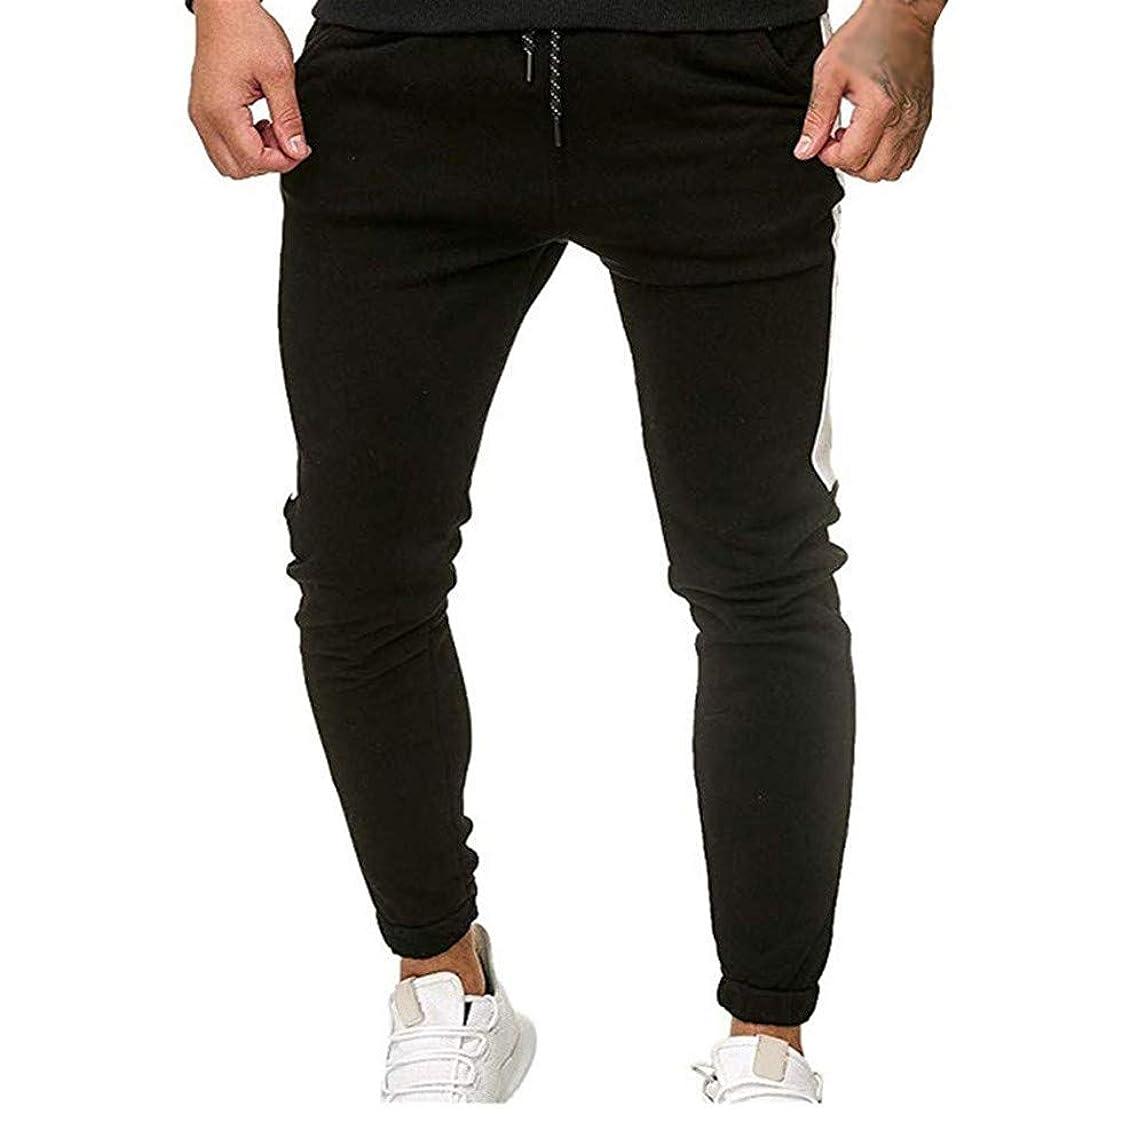 Men Sweatpants Men's Comfort Patchwork Comfort Elastic Waist Pockets Drawstring Joggers Trousers Pants